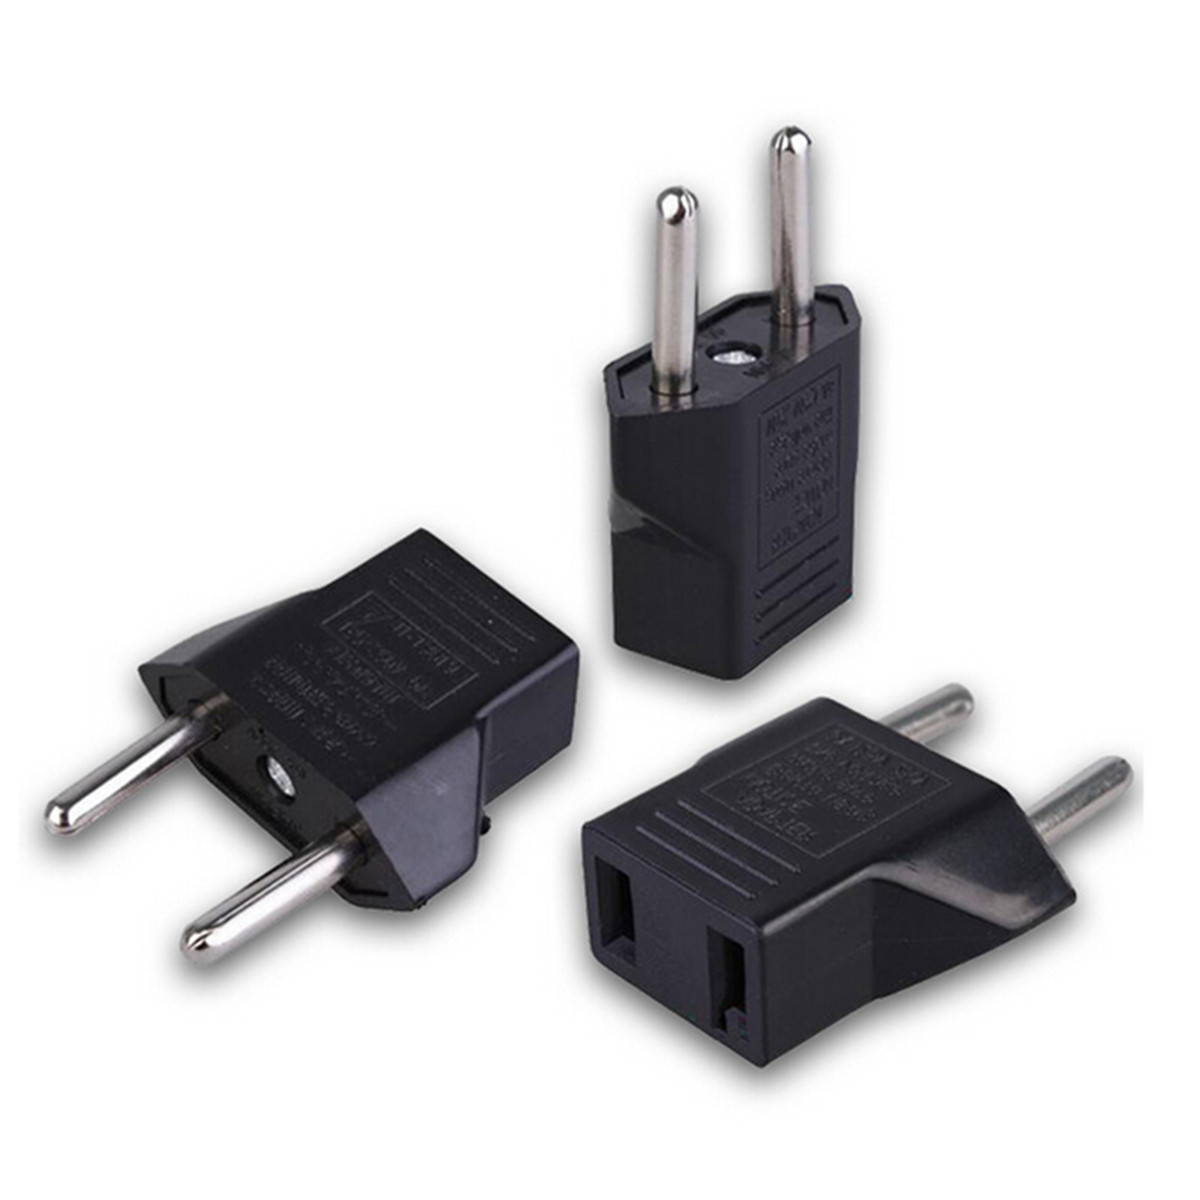 6A USA To EU EU Power Adapter Plug Europe Wall Power Charge Outlet Sockets US 2 Flat Pin To EU 2 Round Pin Plug Socket Adapte